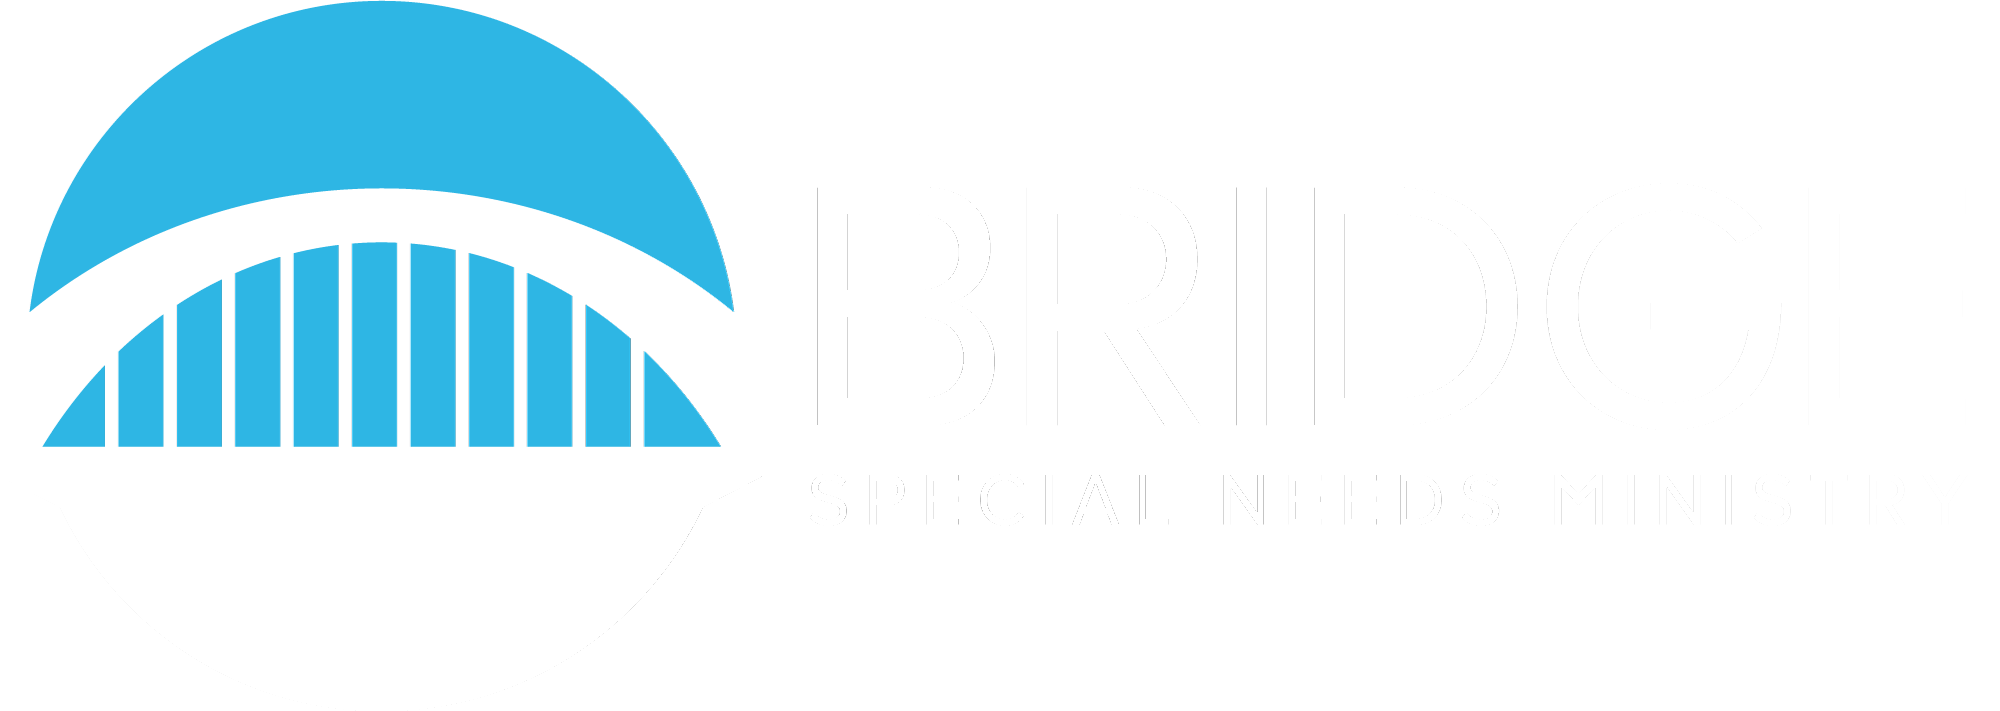 bridge-logo-wh.png